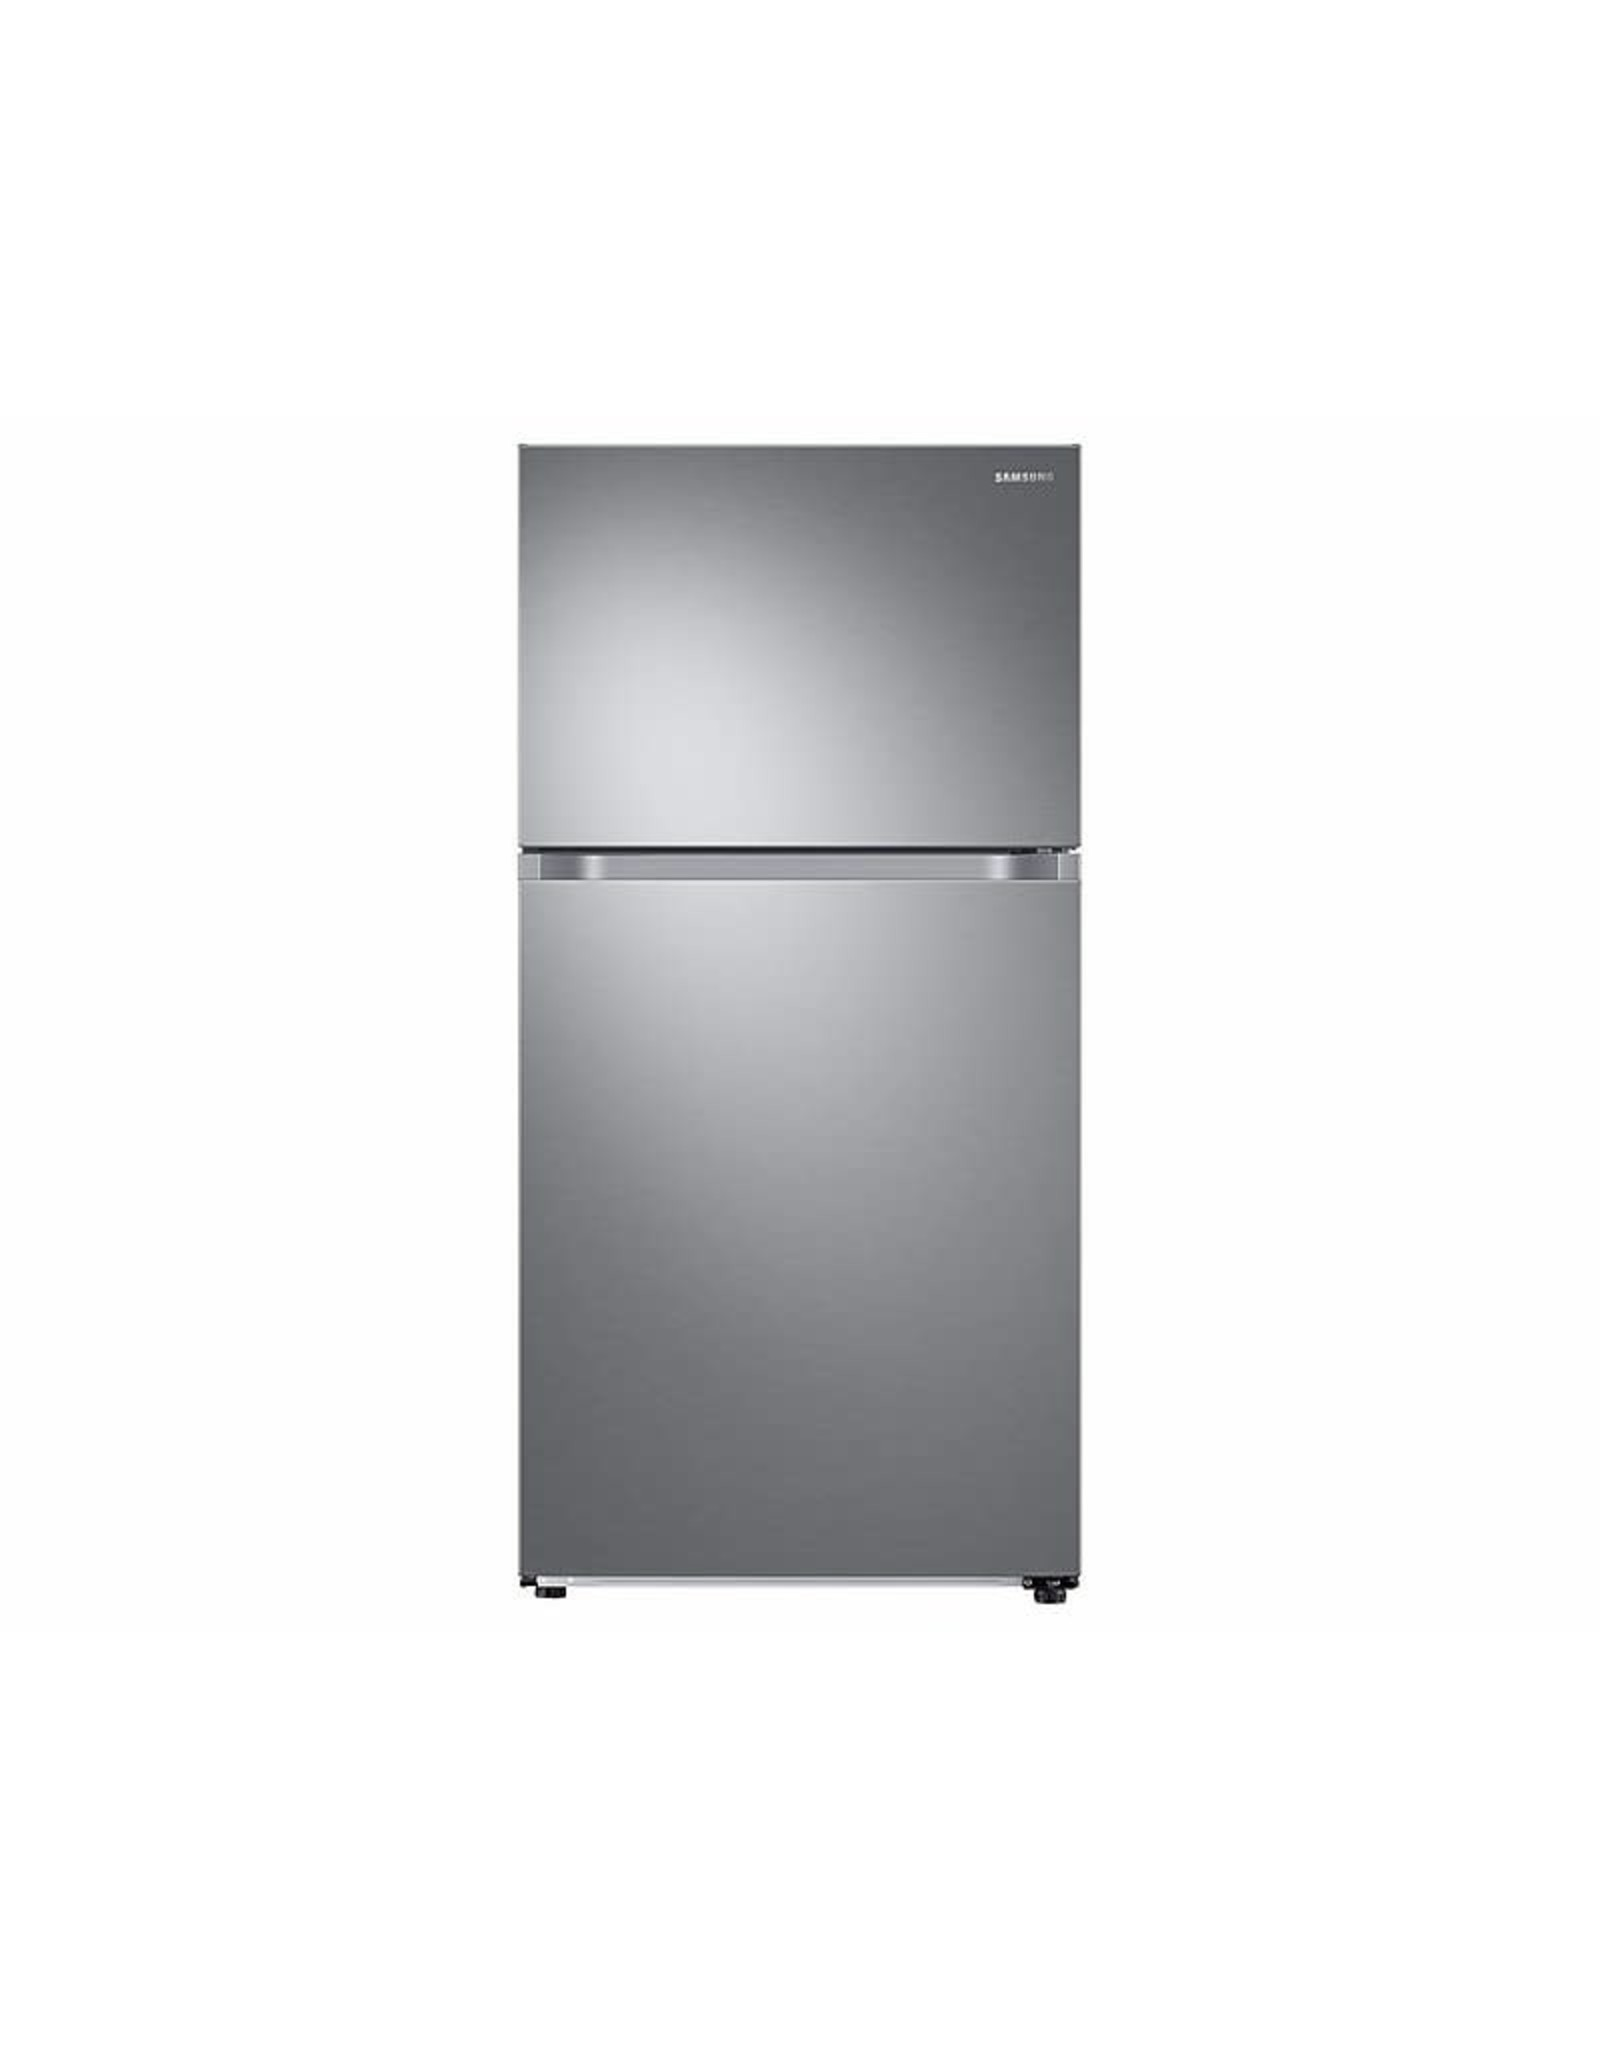 SAMSUNG RT21M6213SR Samsung 21cf Top Mount Refrigerator - optional Ice Maker